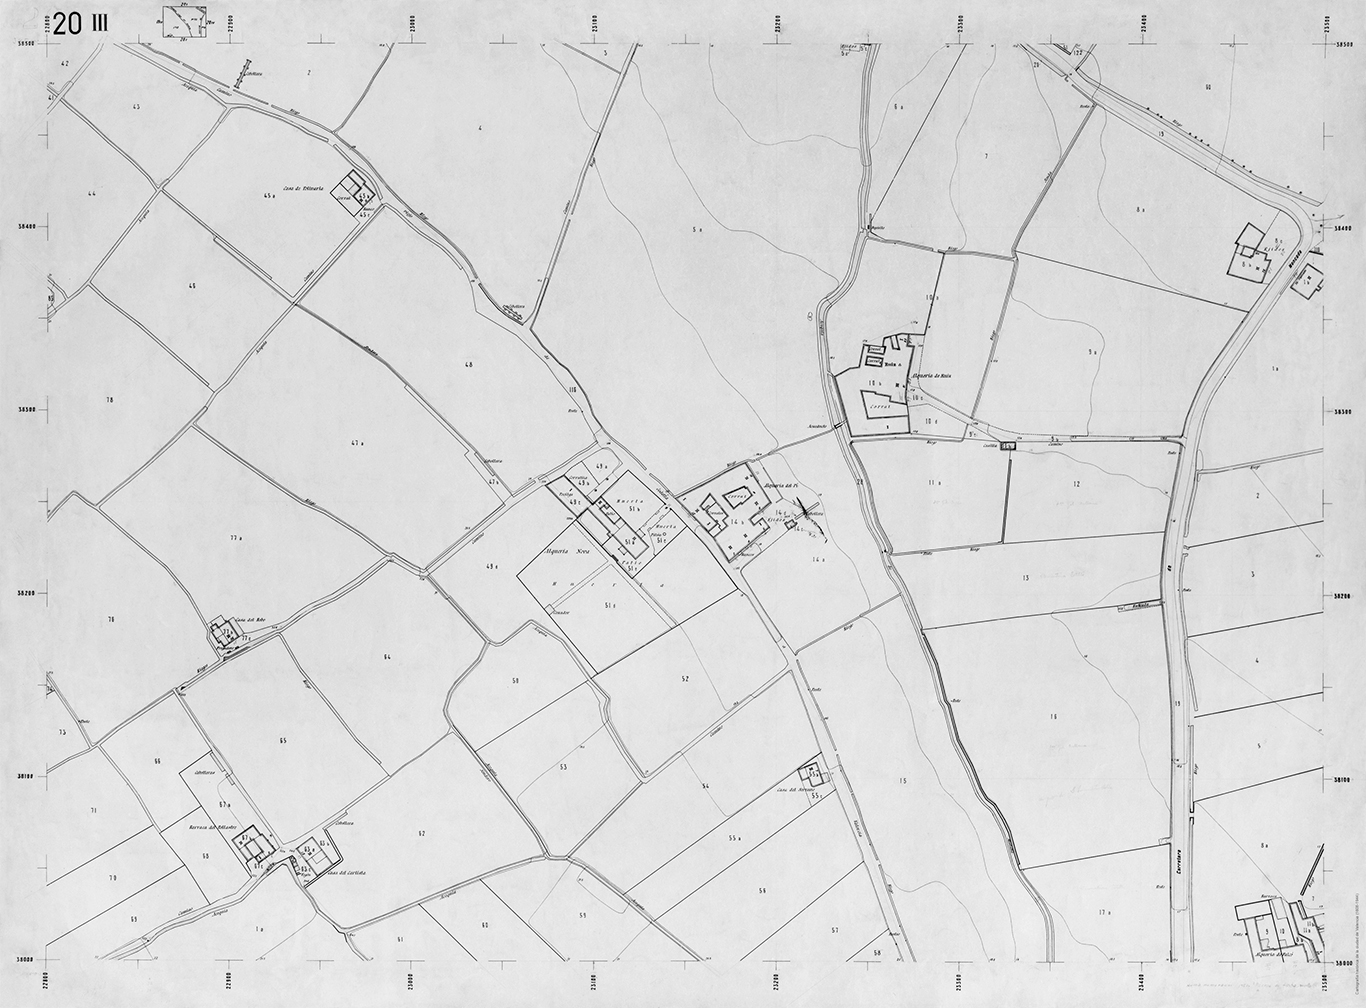 planimetría rústica 1944